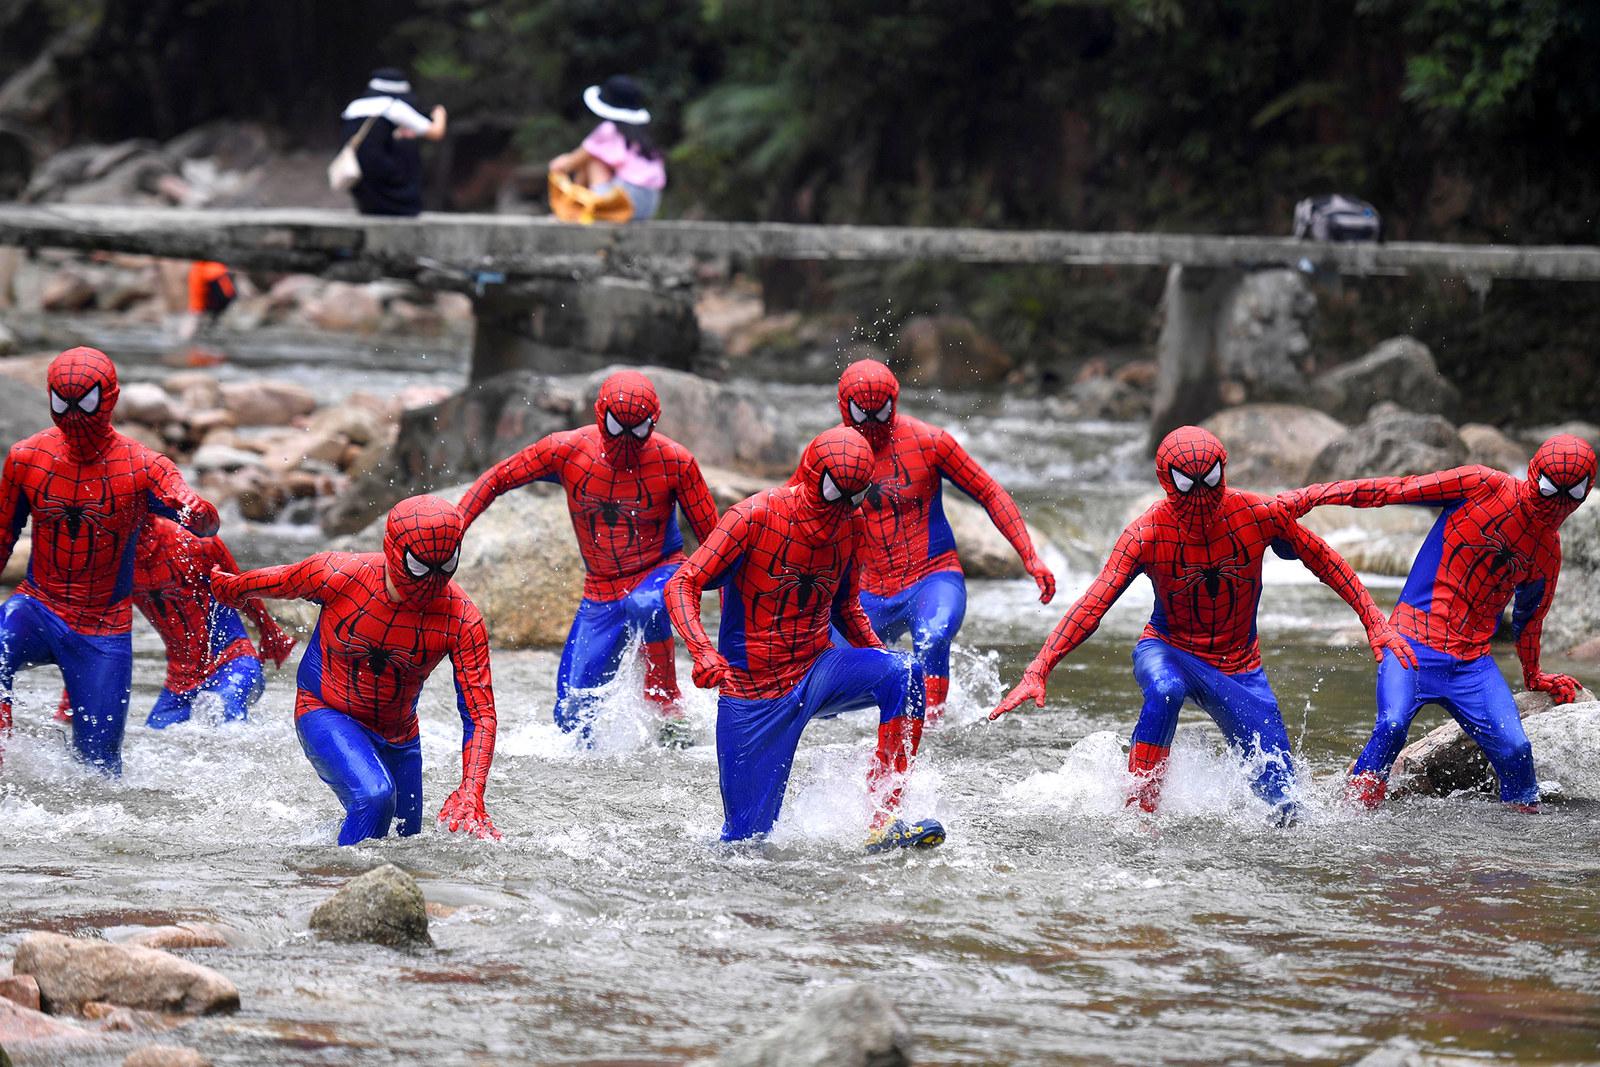 Открытки днем, картинки приколы человека паука